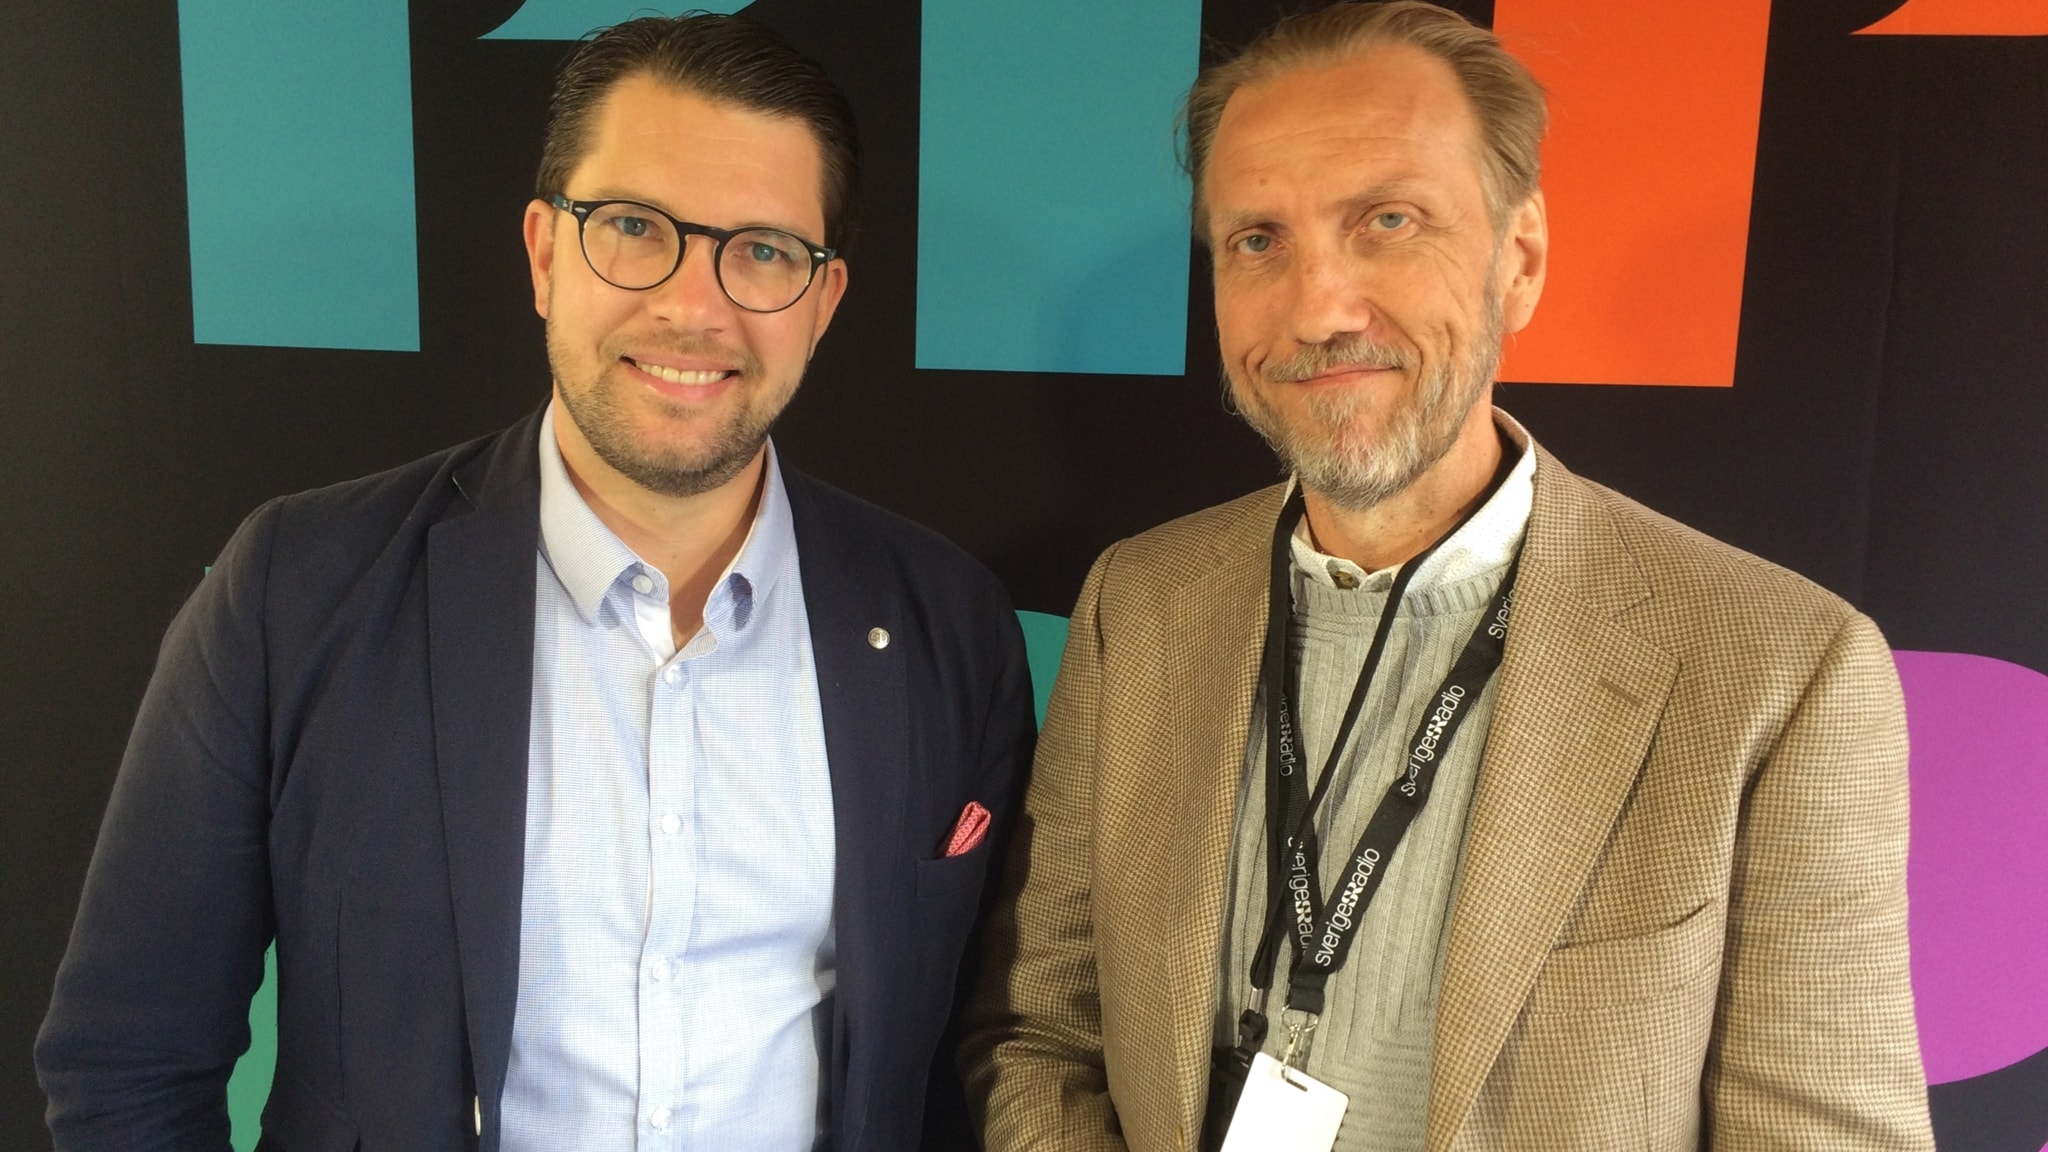 Erik Blix möter Jimmie Åkesson i Enköping